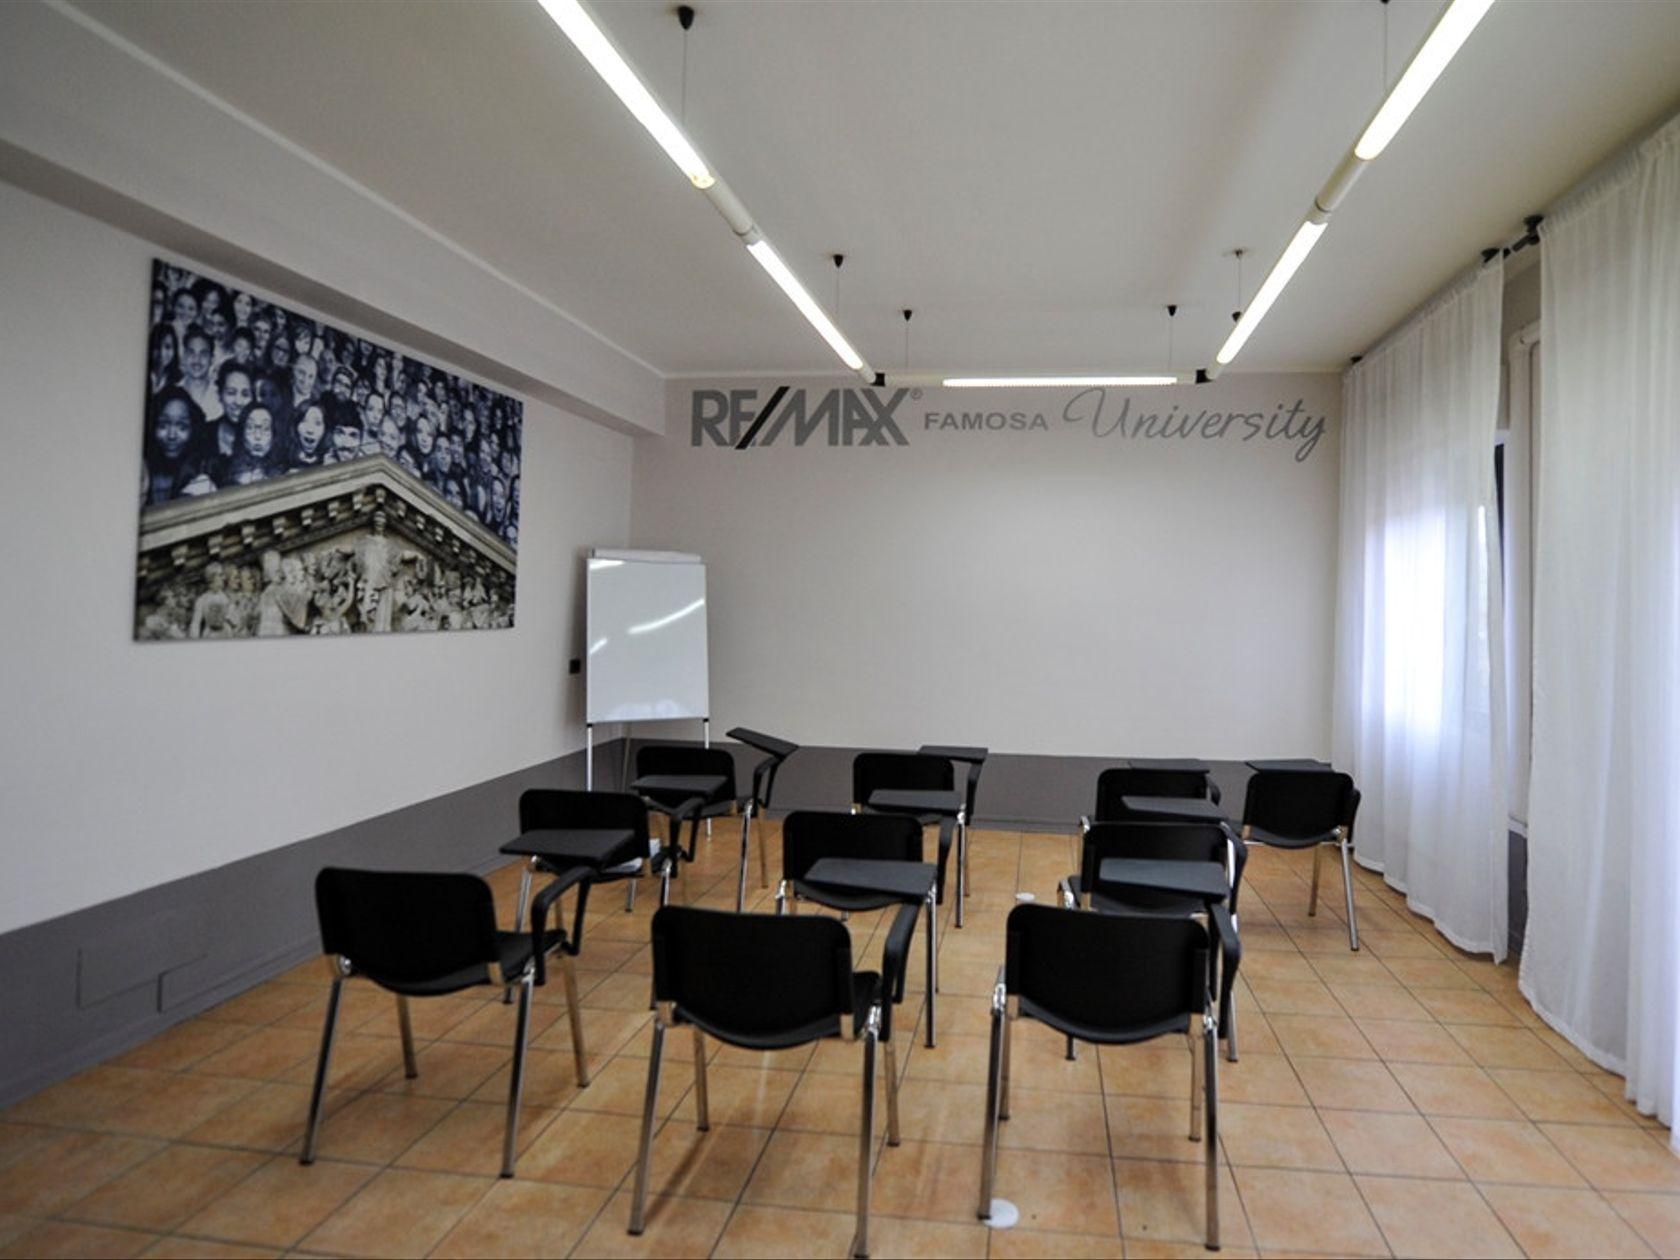 RE/MAX Famosa Perugia - Foto 4